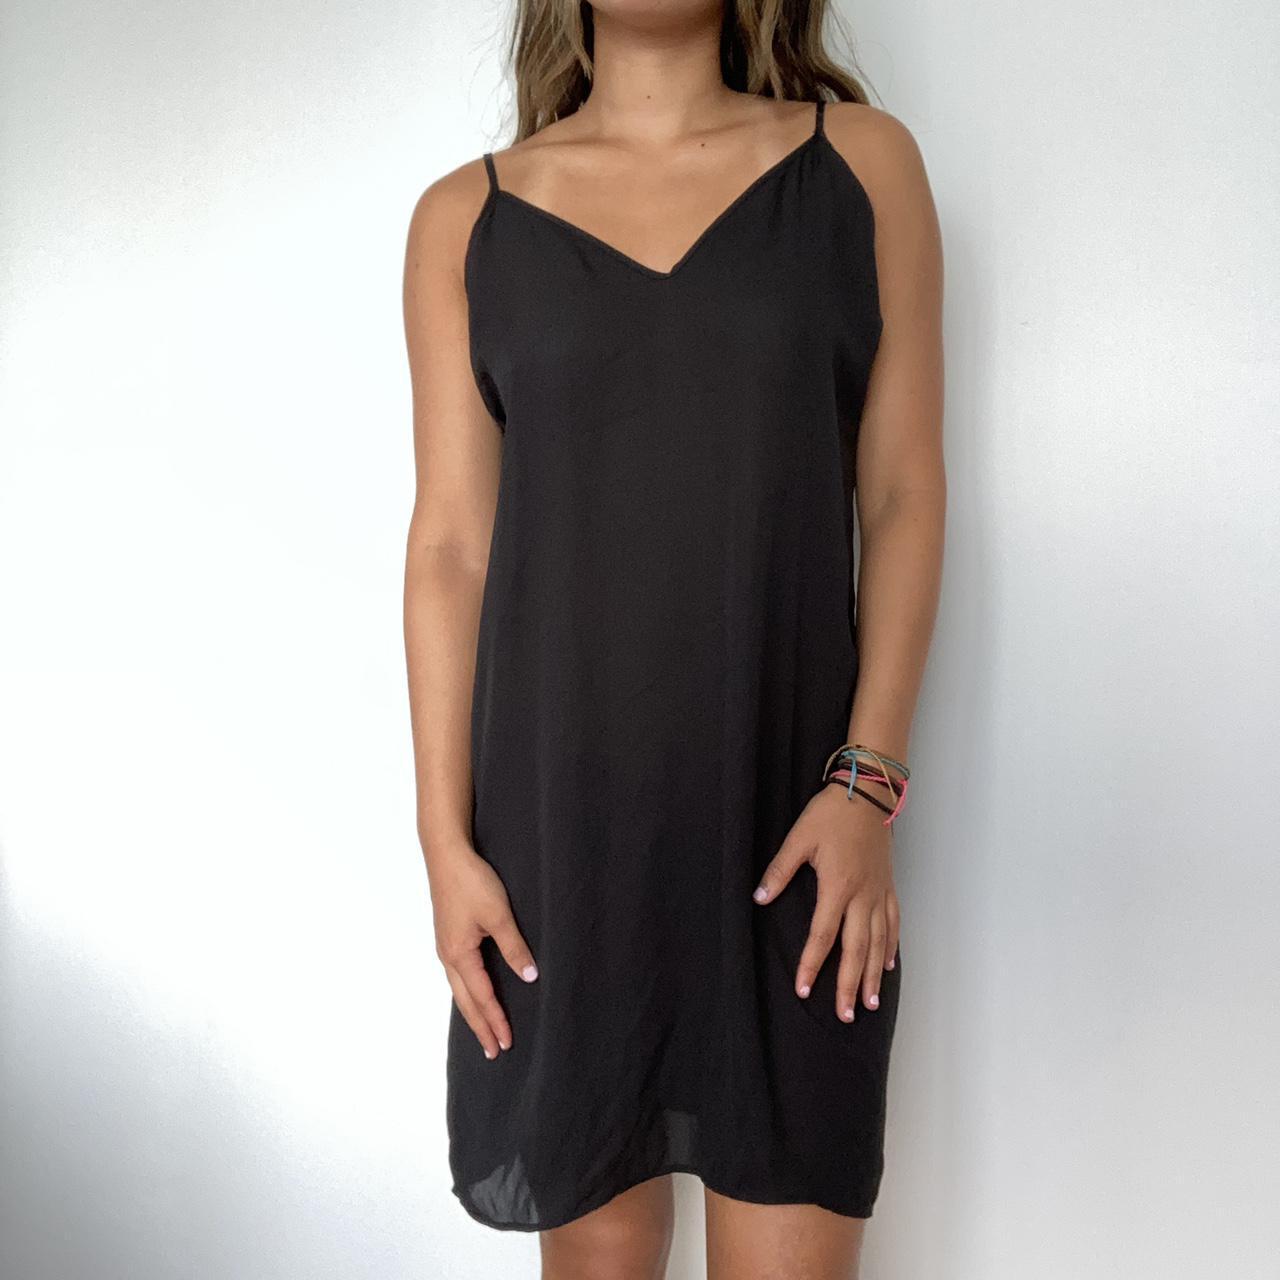 Product Image 1 - ☆ black midi slip dress